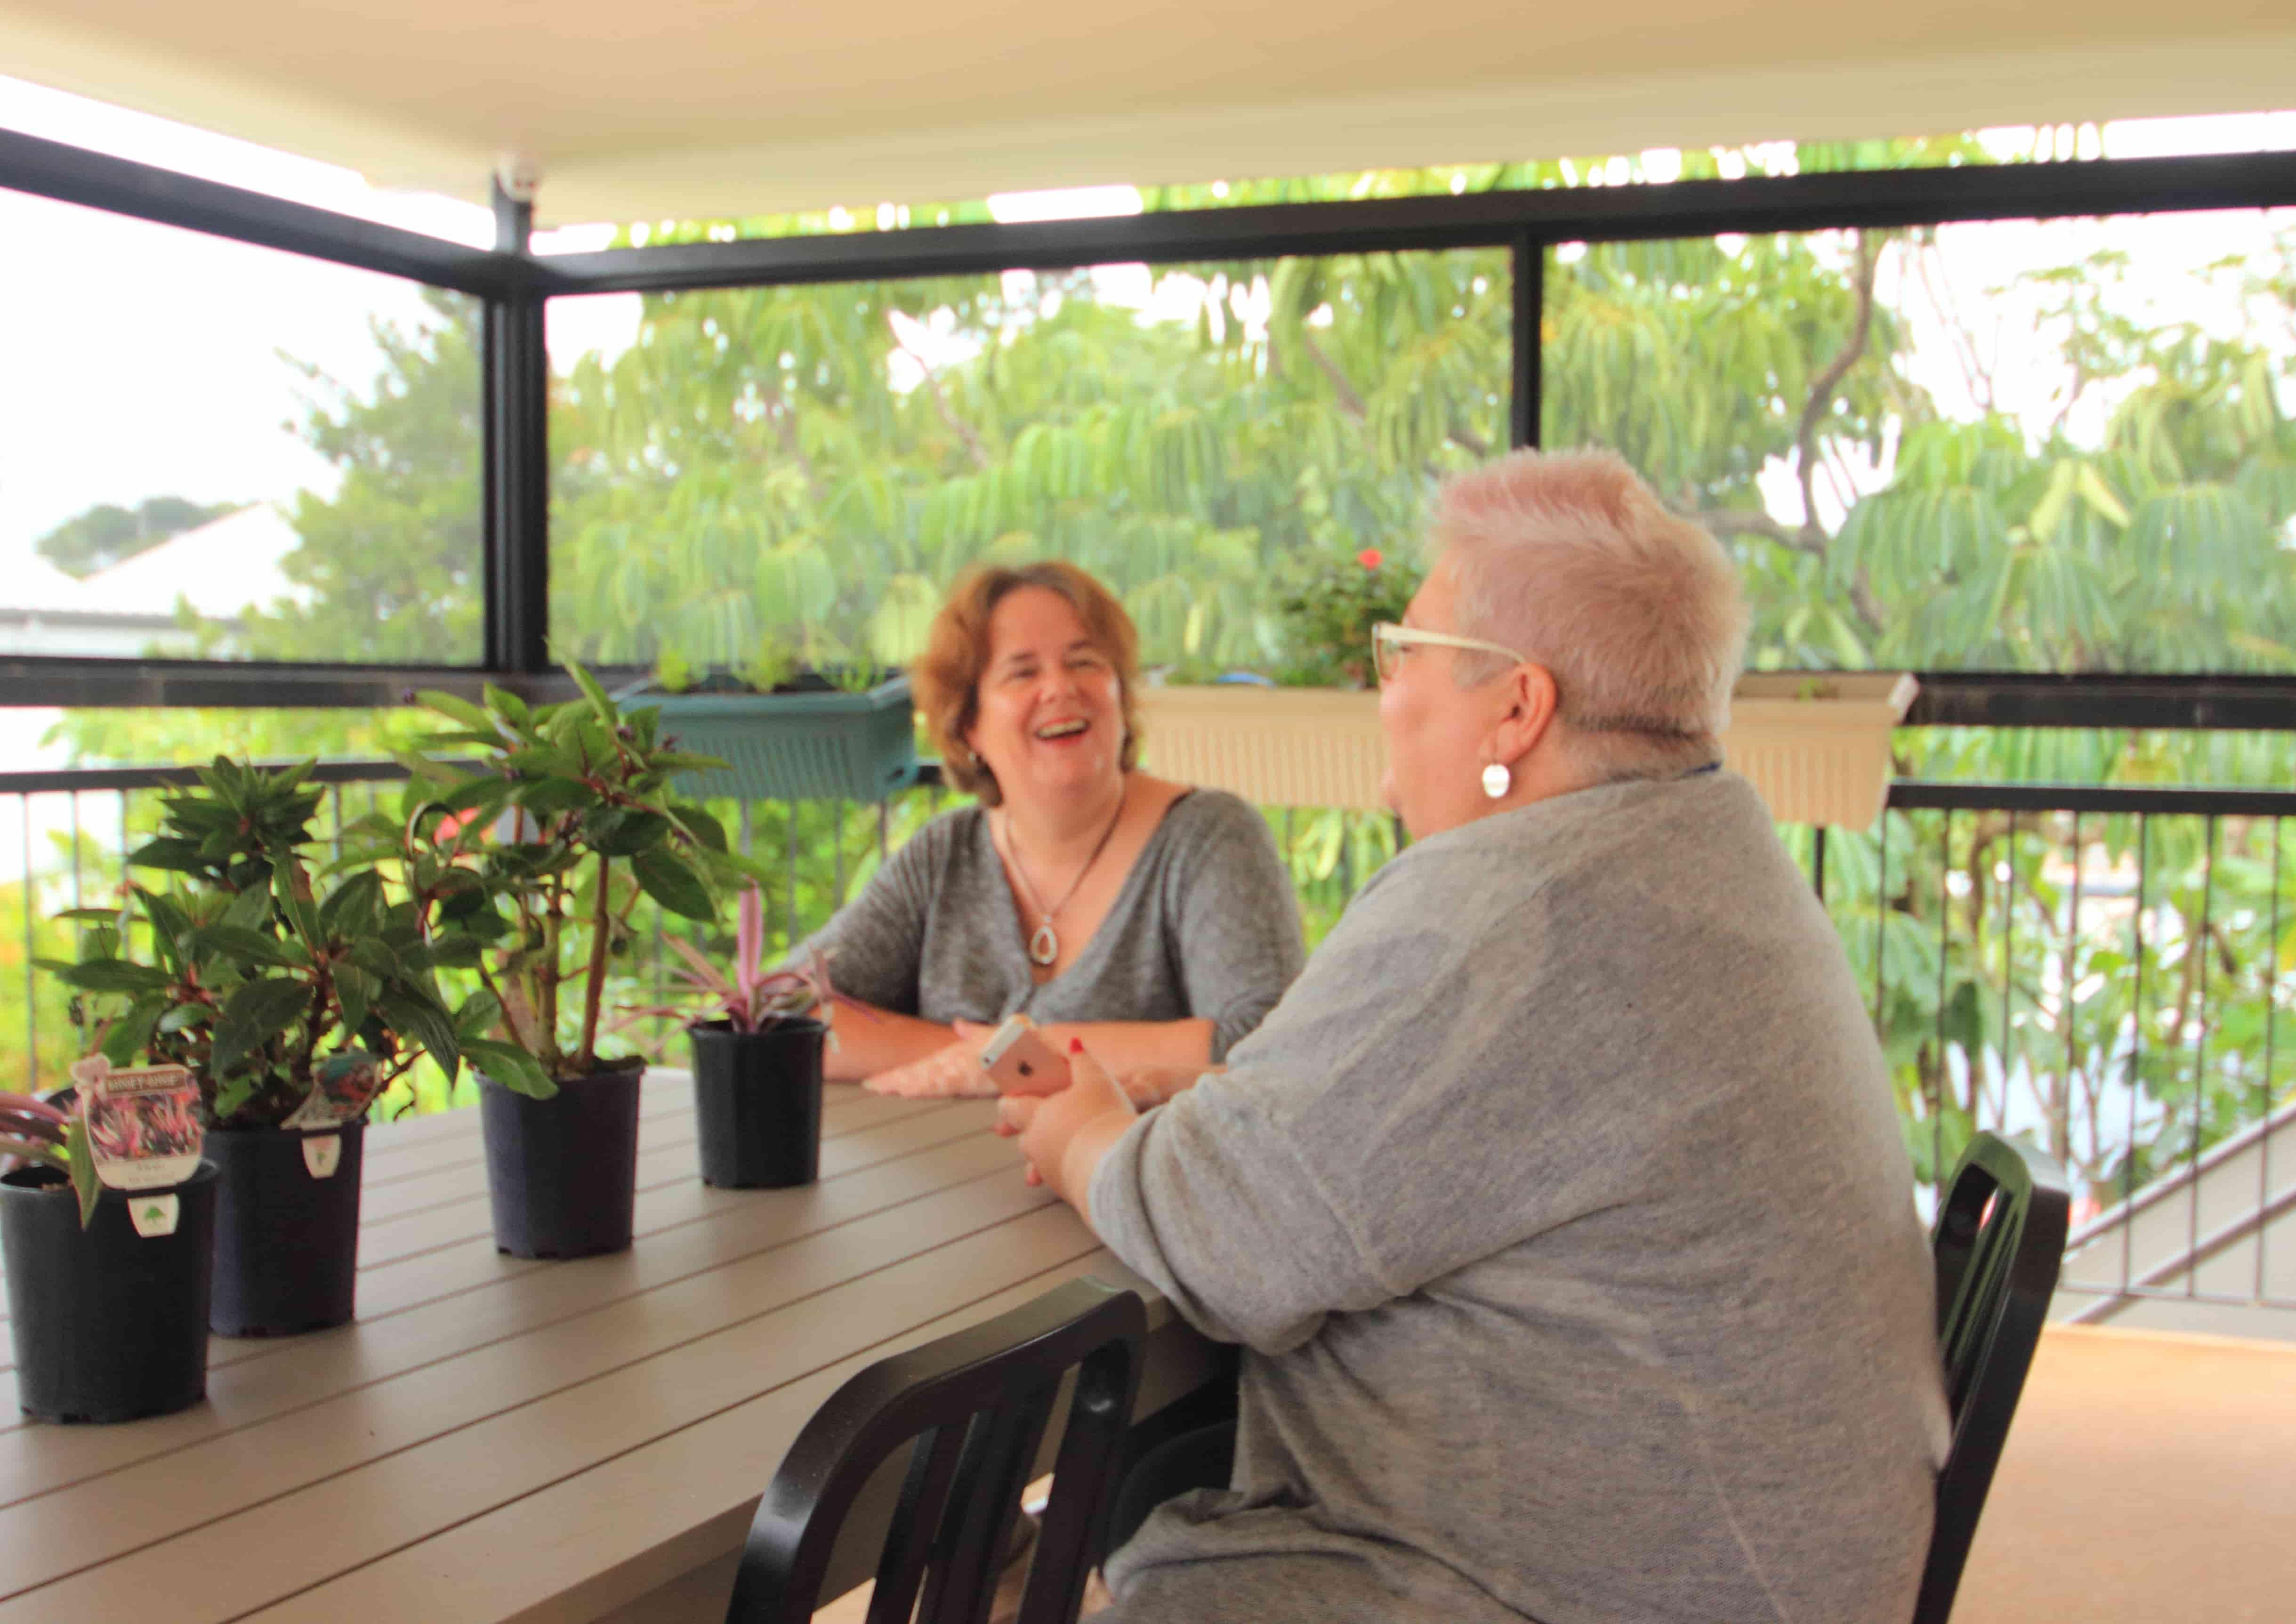 Two women at Brisbane boarding house